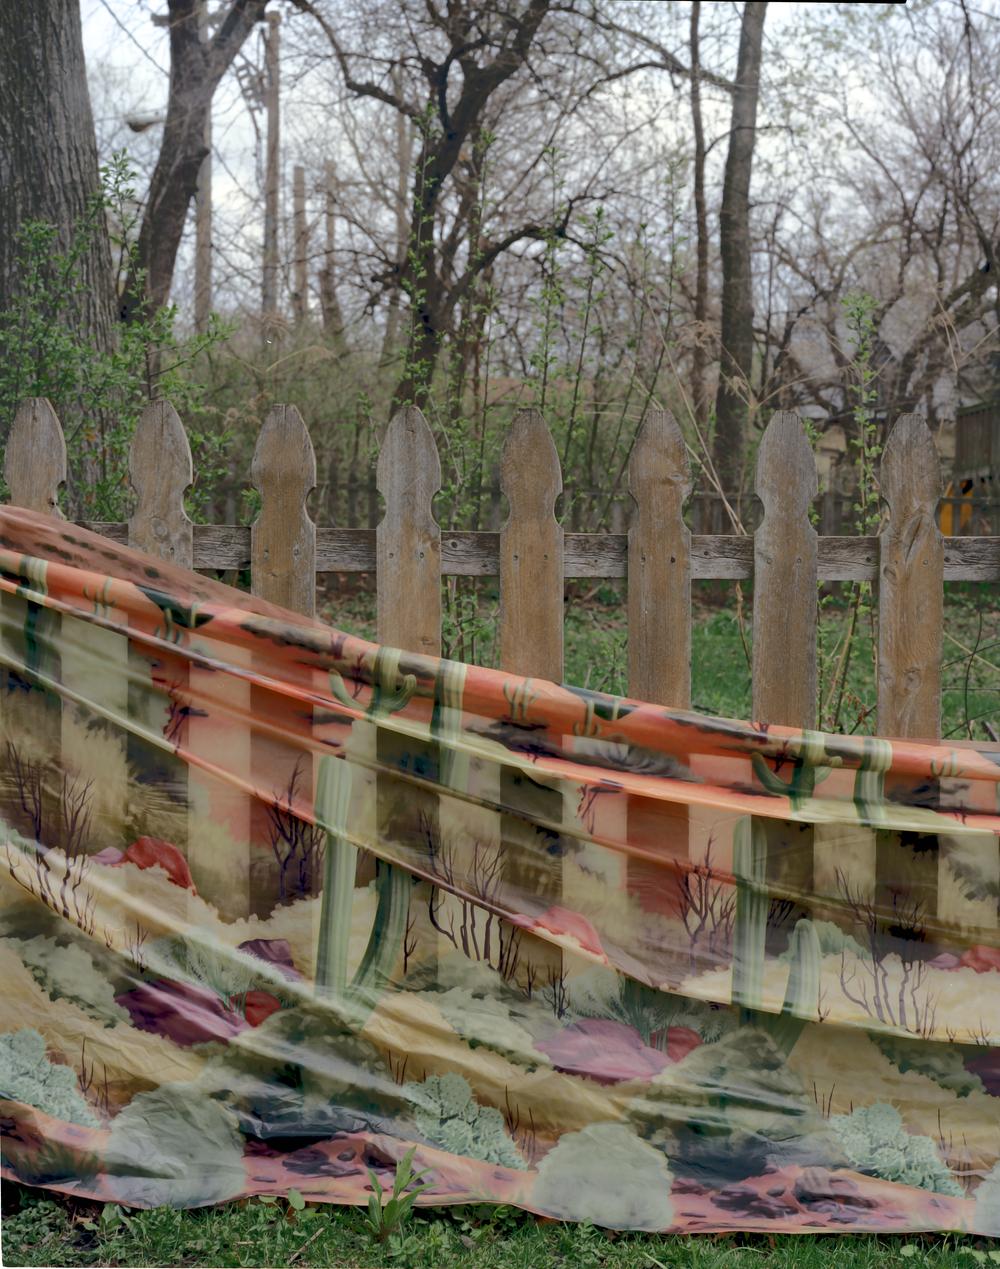 fence2 001.jpg